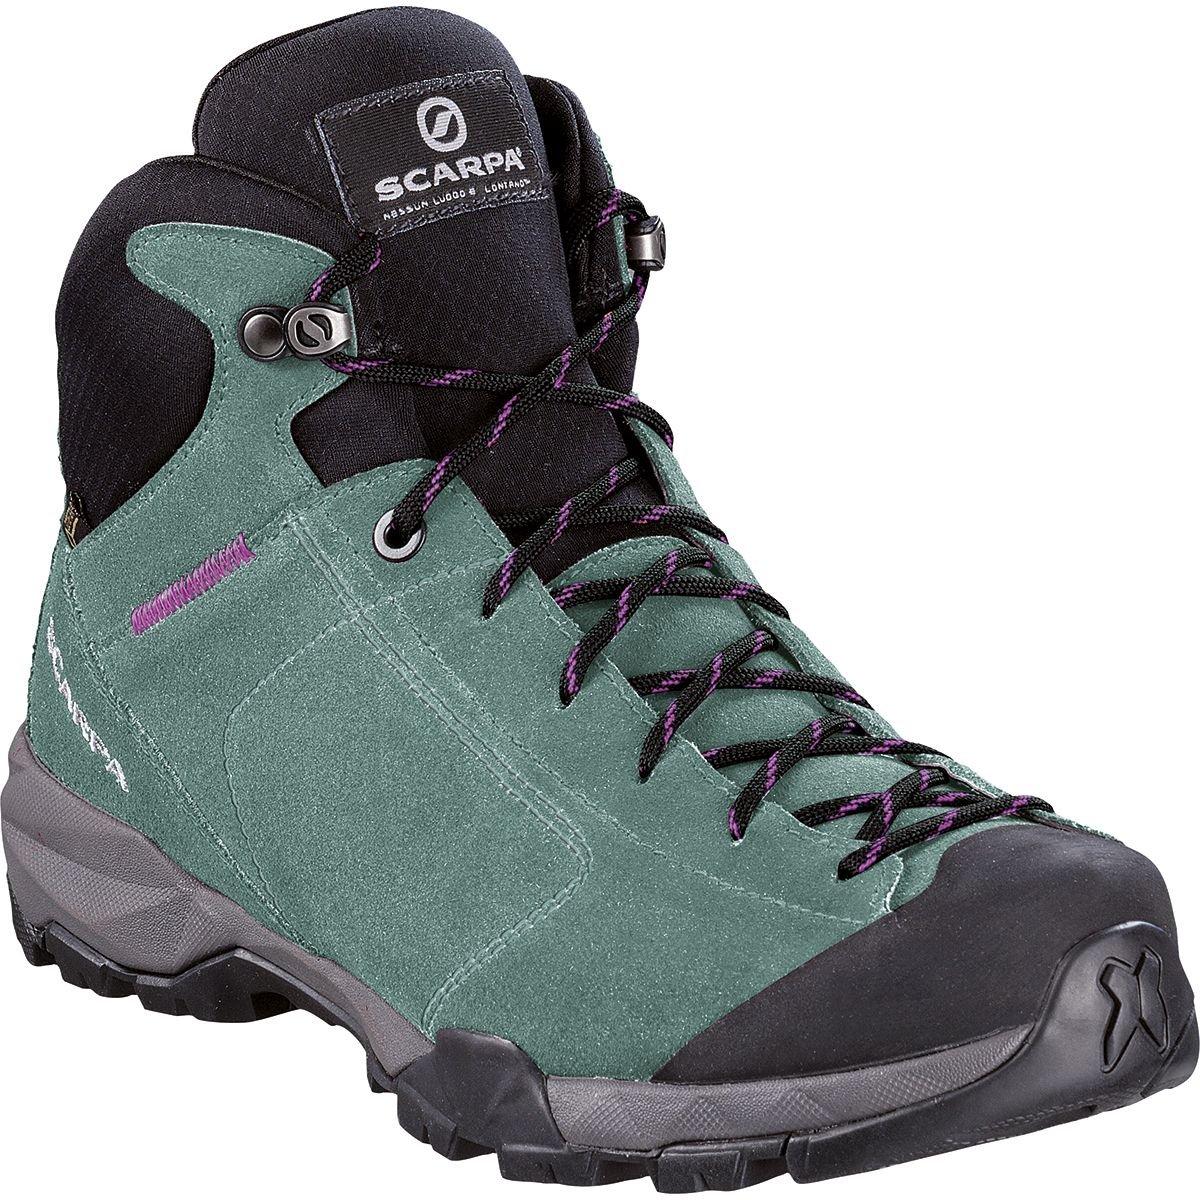 Scarpa Schuhe Hike Mojito Hike Schuhe GTX Damens Größe 41 jade 9912e5